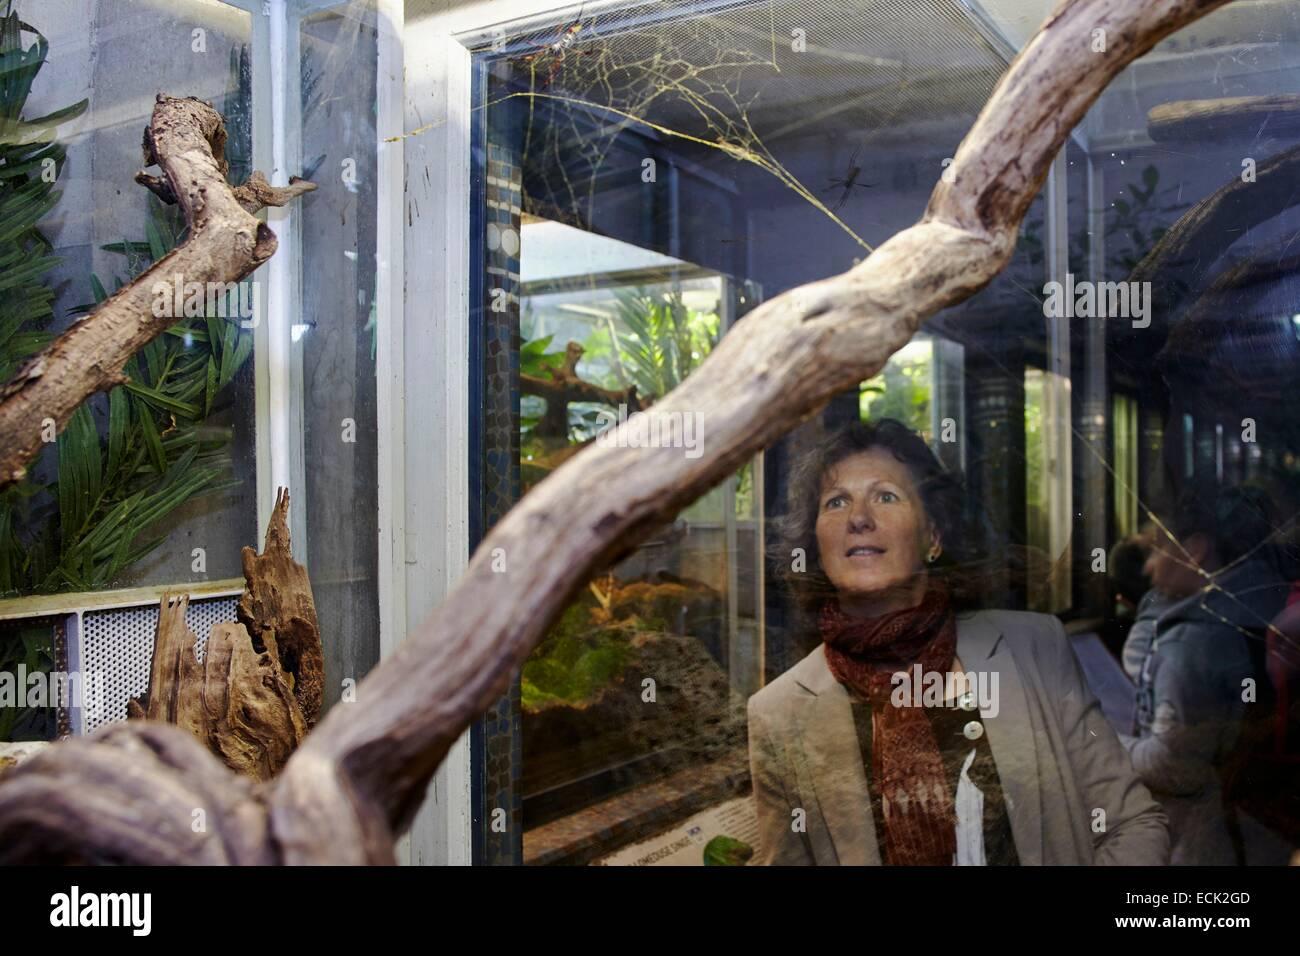 France, Paris, National Museum of Natural History, Botanical Gardens, Christine Rollard, araneologist, watching - Stock Image